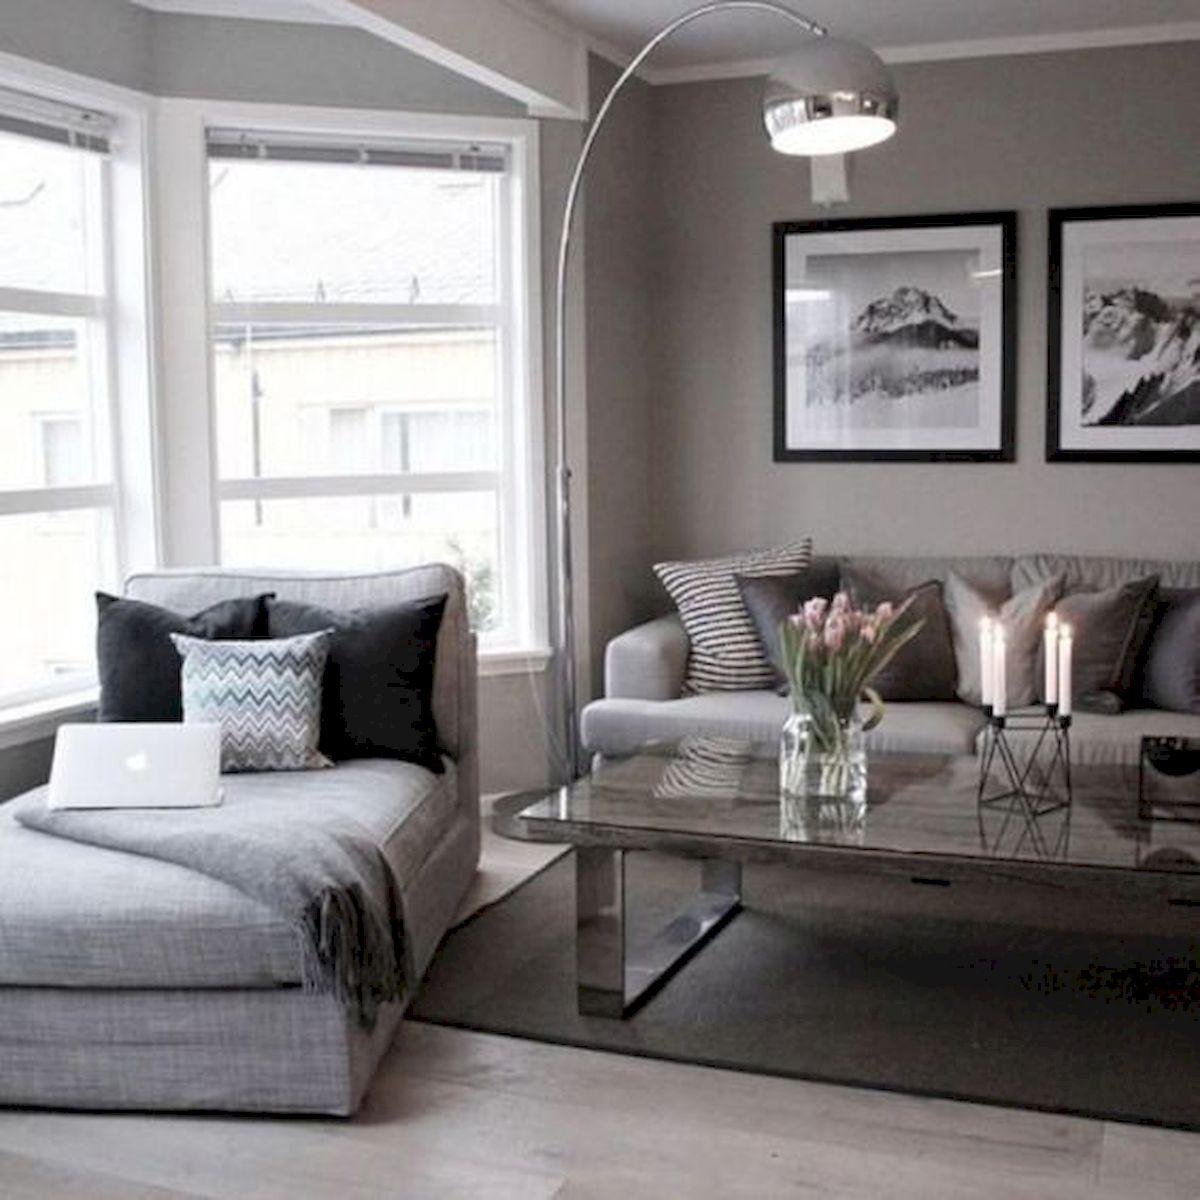 50 Gorgeous Living Room Decor and Design Ideas (33)